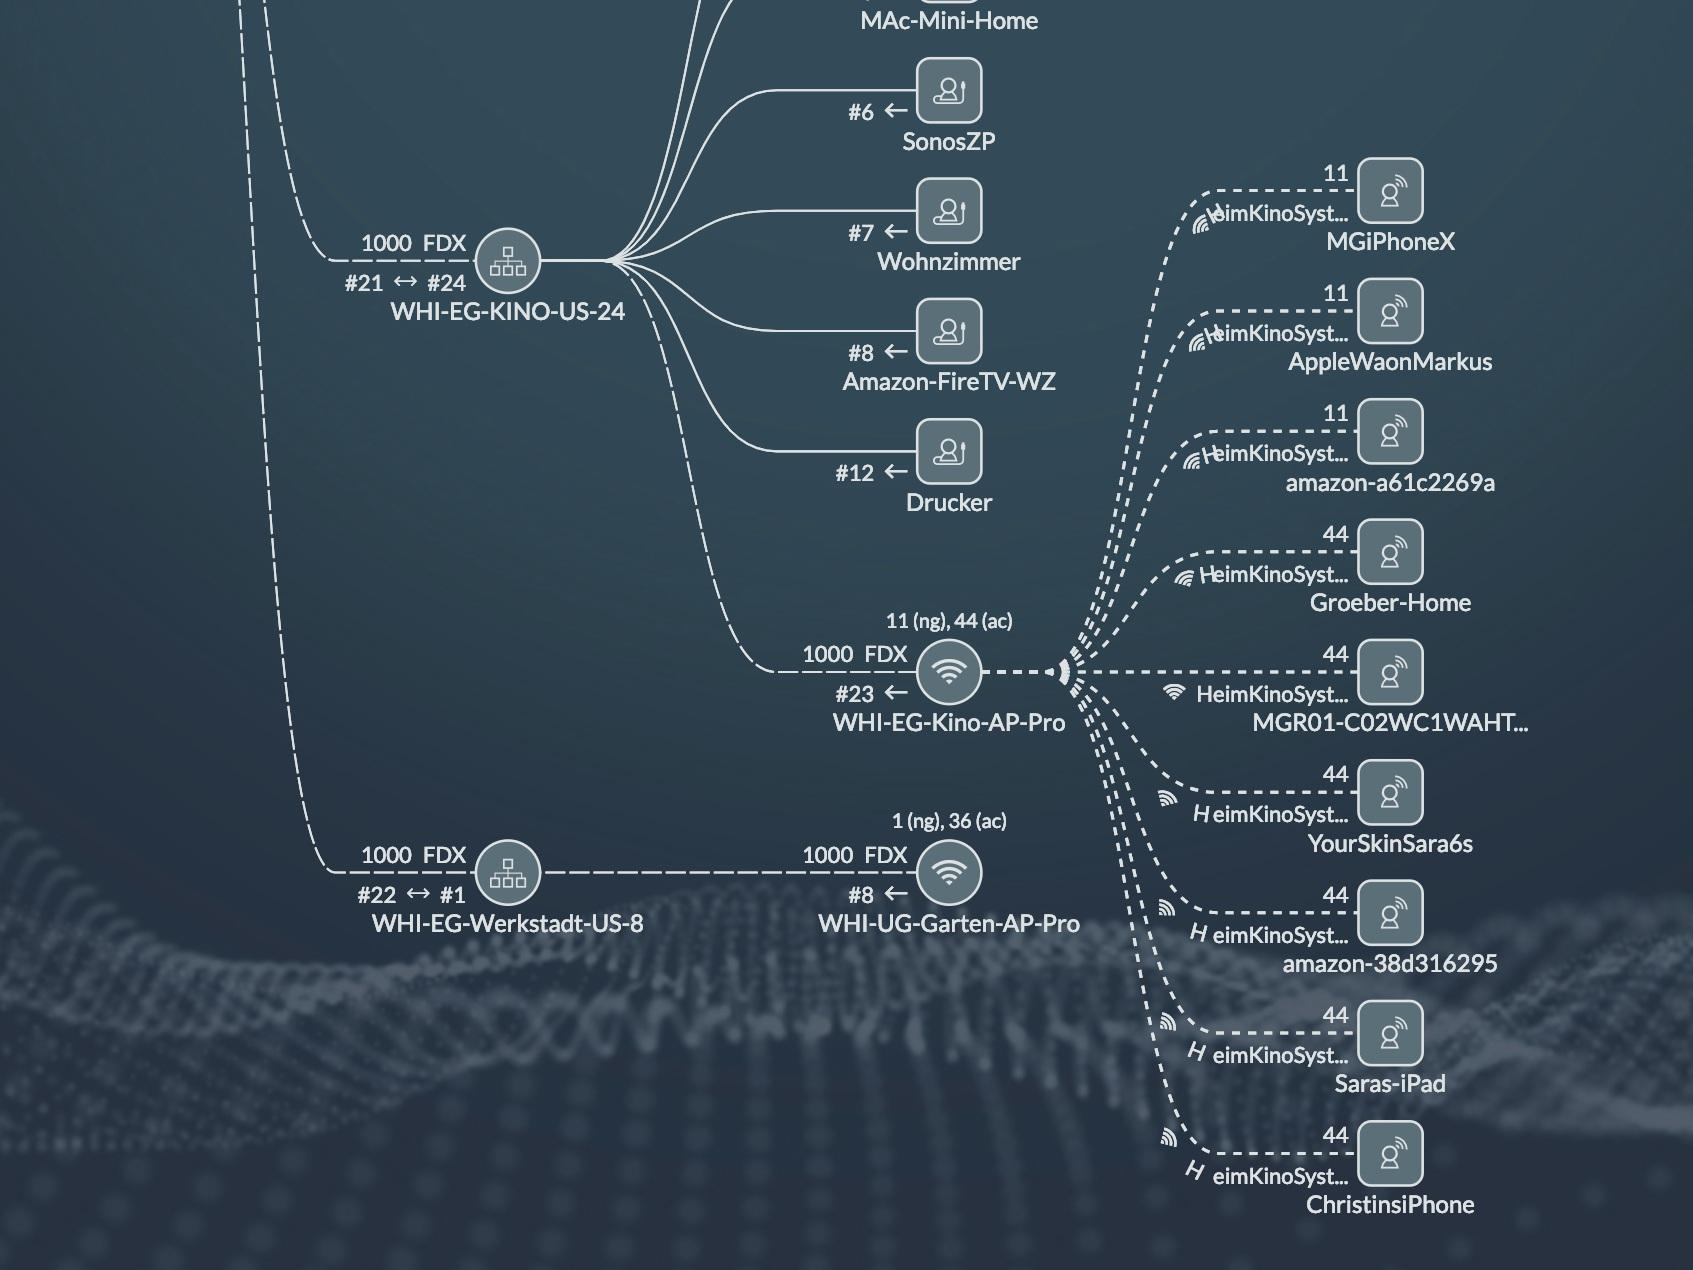 Netzwerk Topologie mit Clienten.png